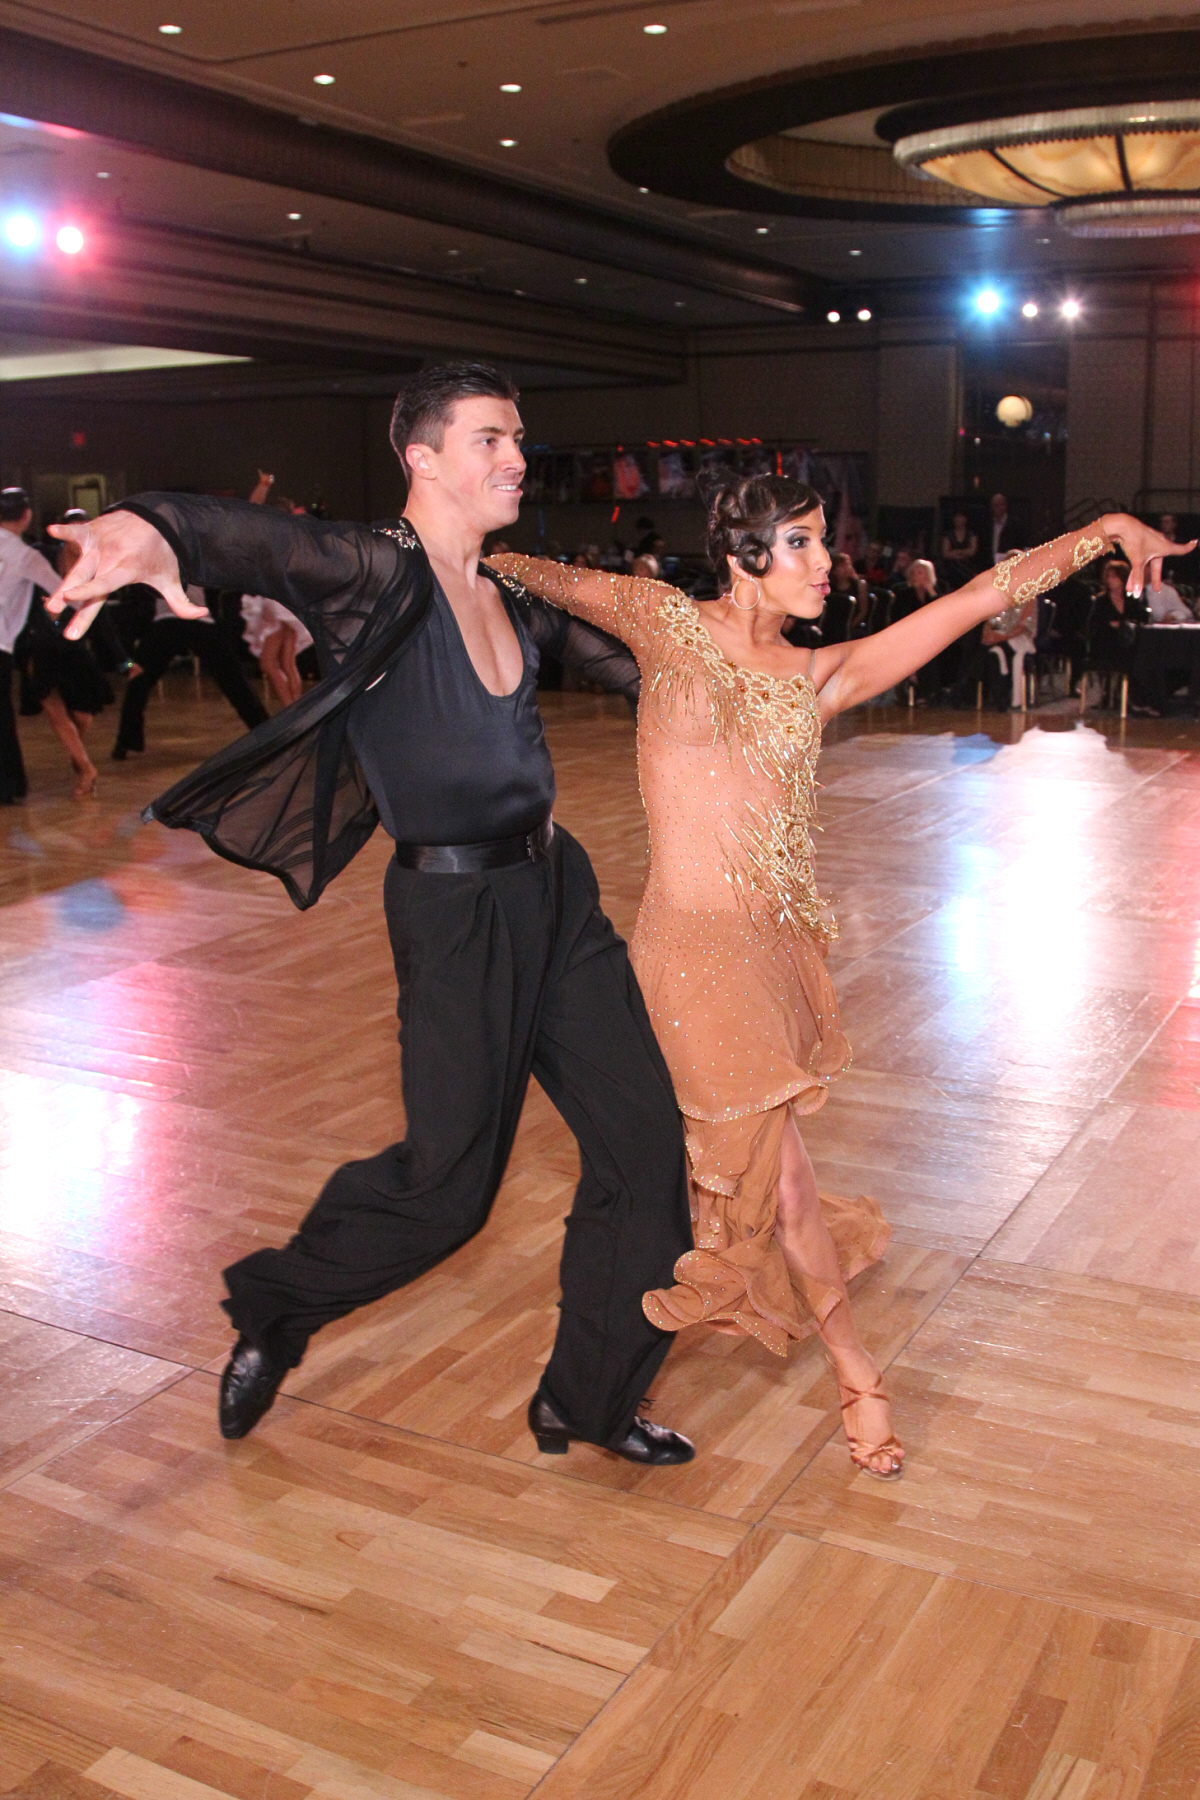 Dance Center USA image 29